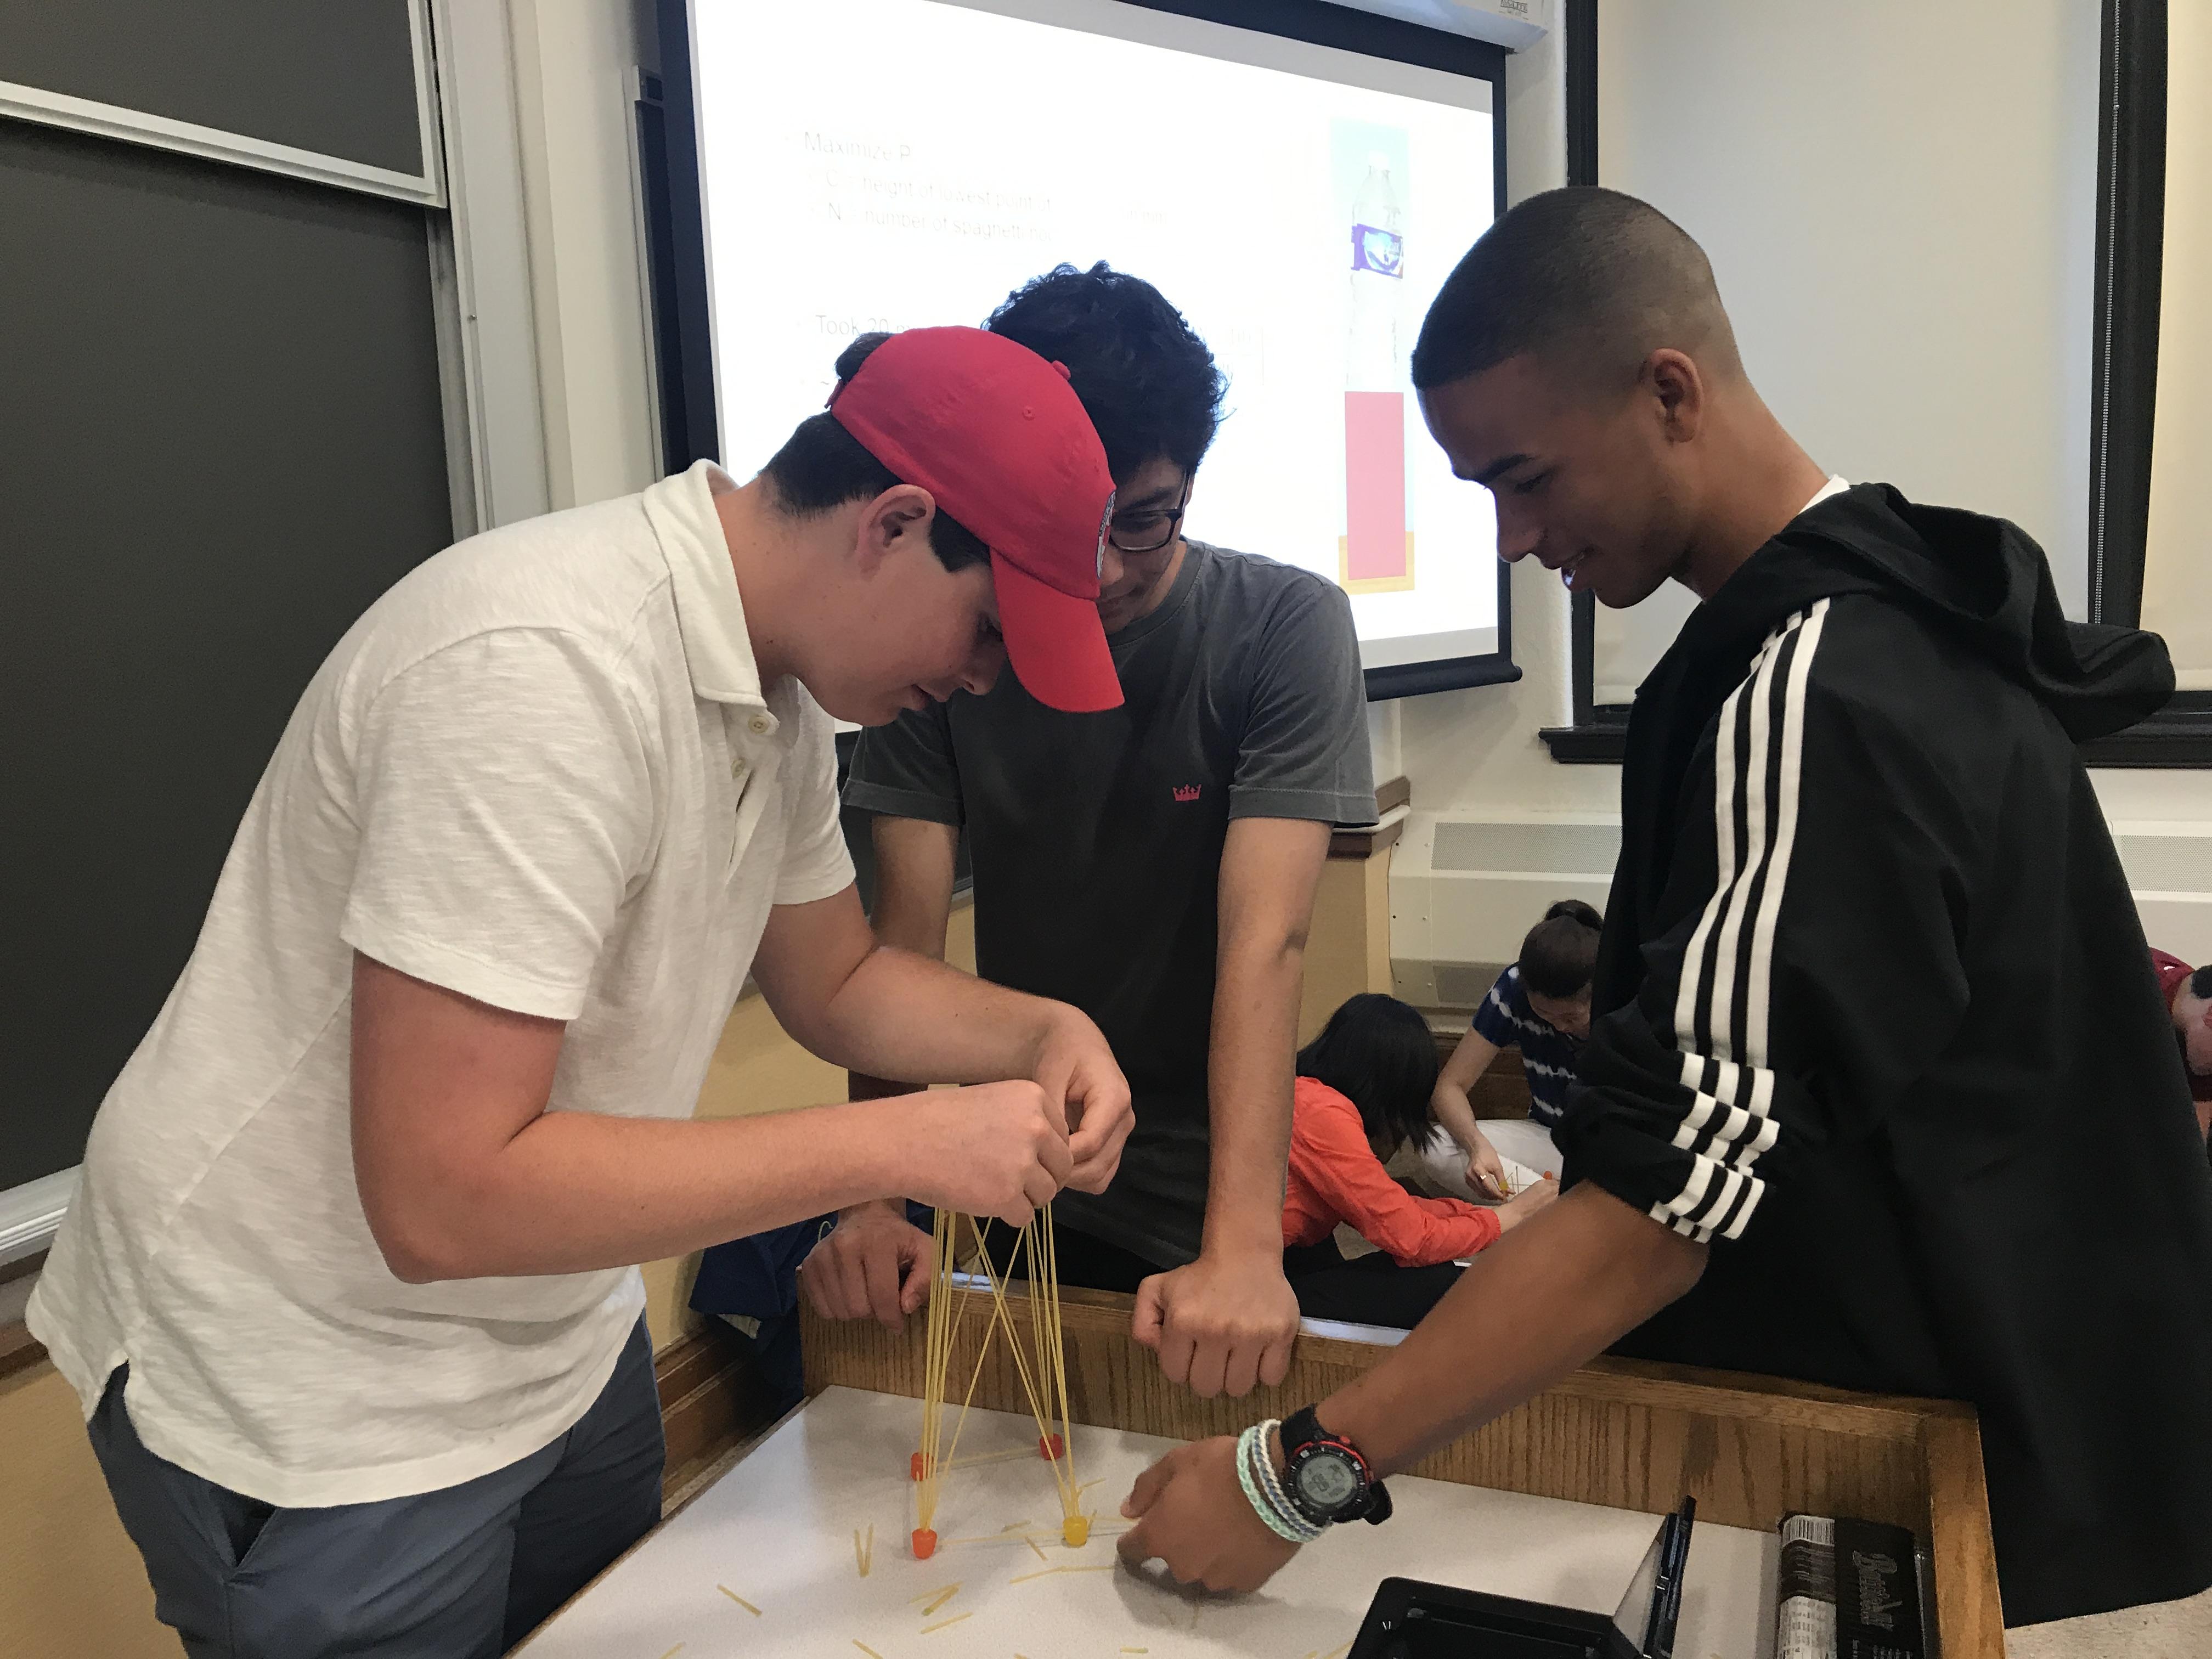 Summer Program - Computer Science | Engineering Summer Academy at Penn